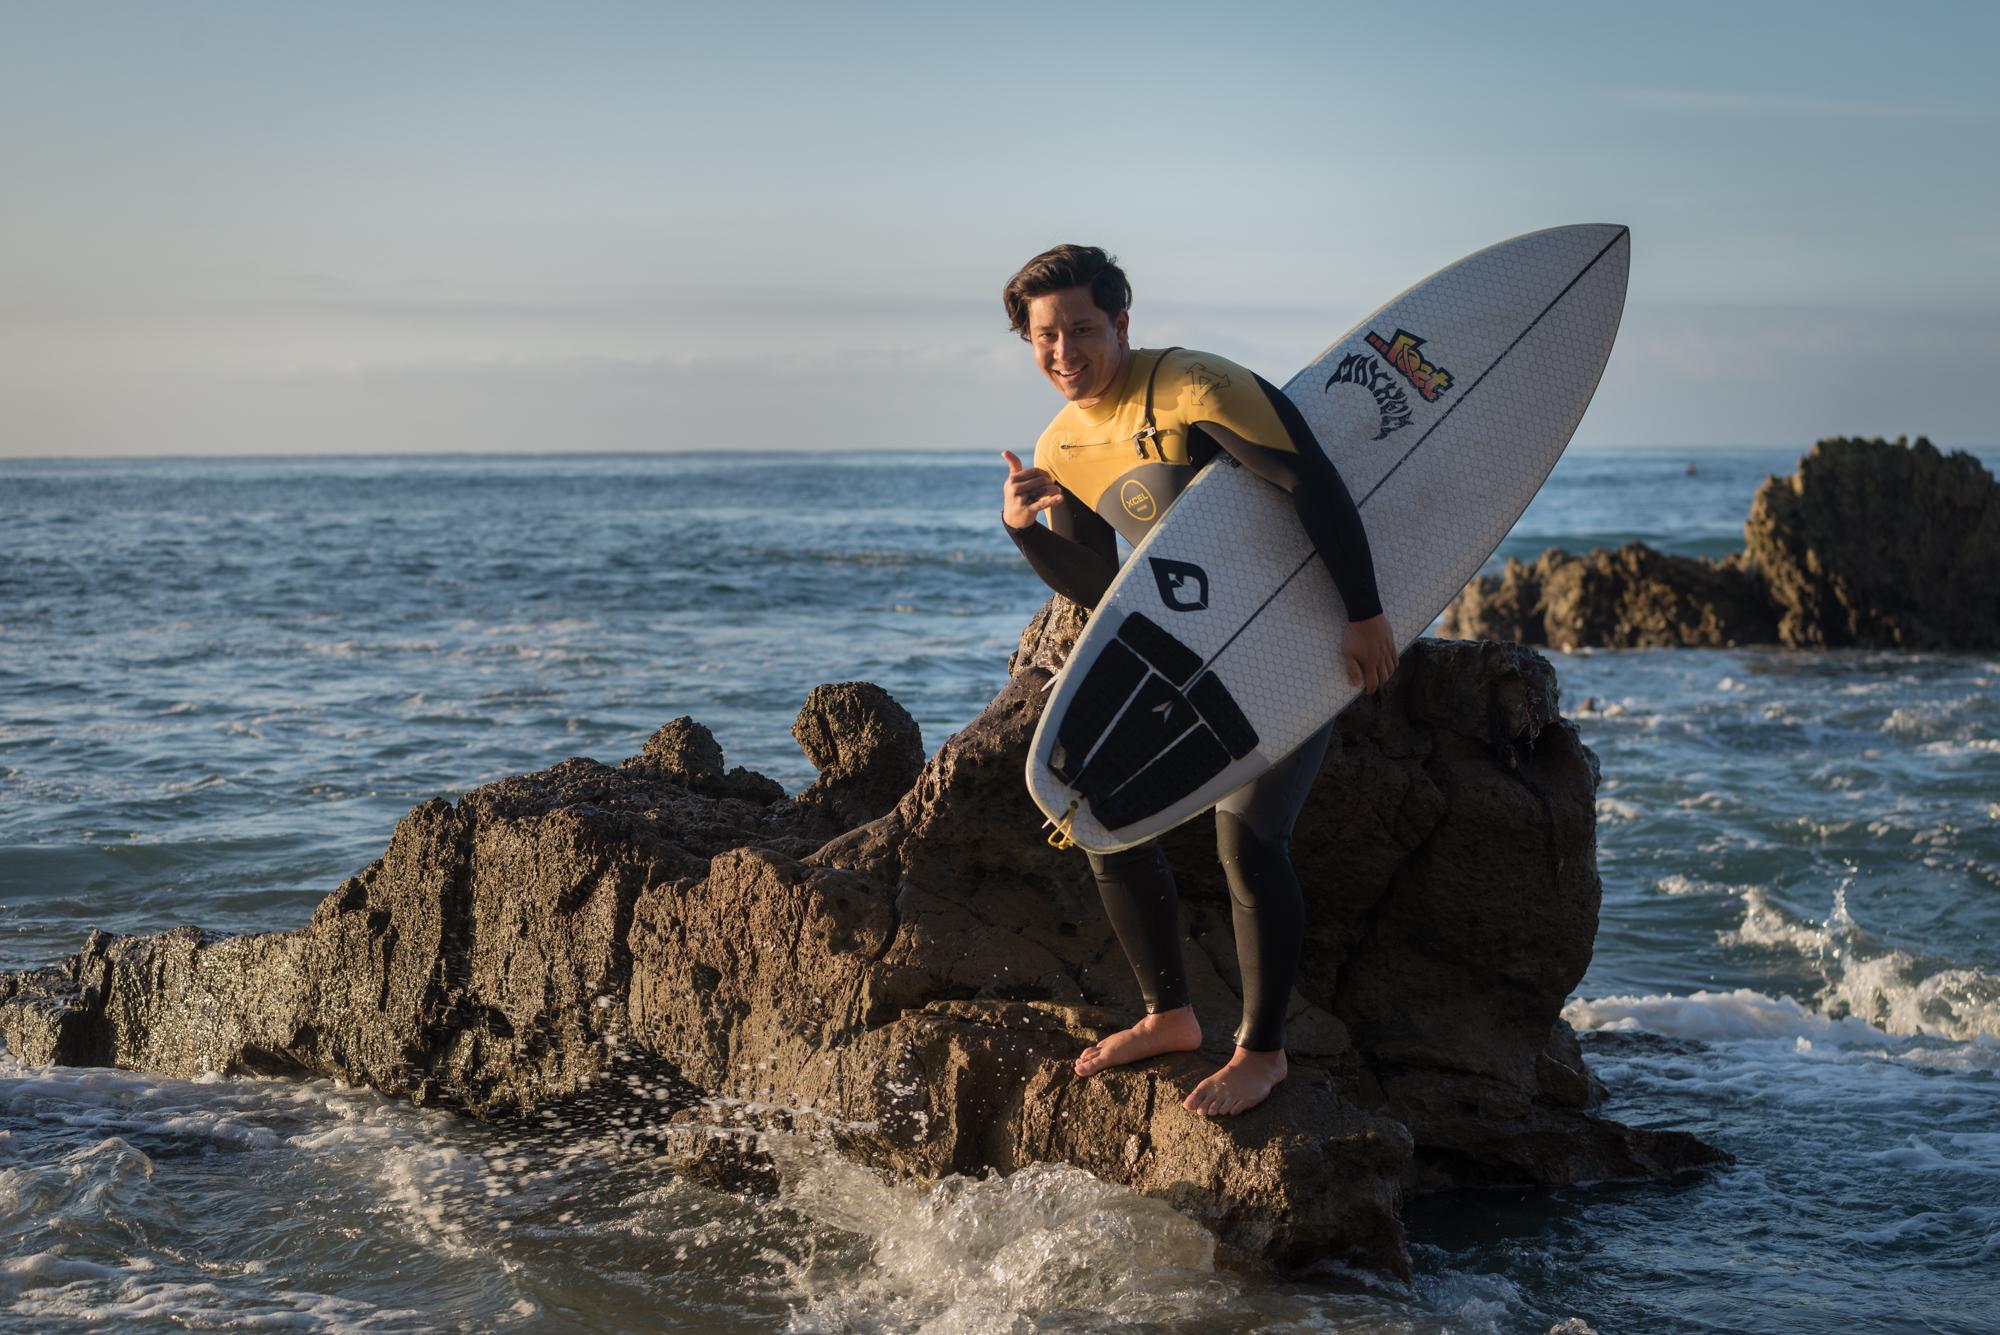 Surfer-Environmental-Portrait_Active-Lifestyle-Photography014.JPG